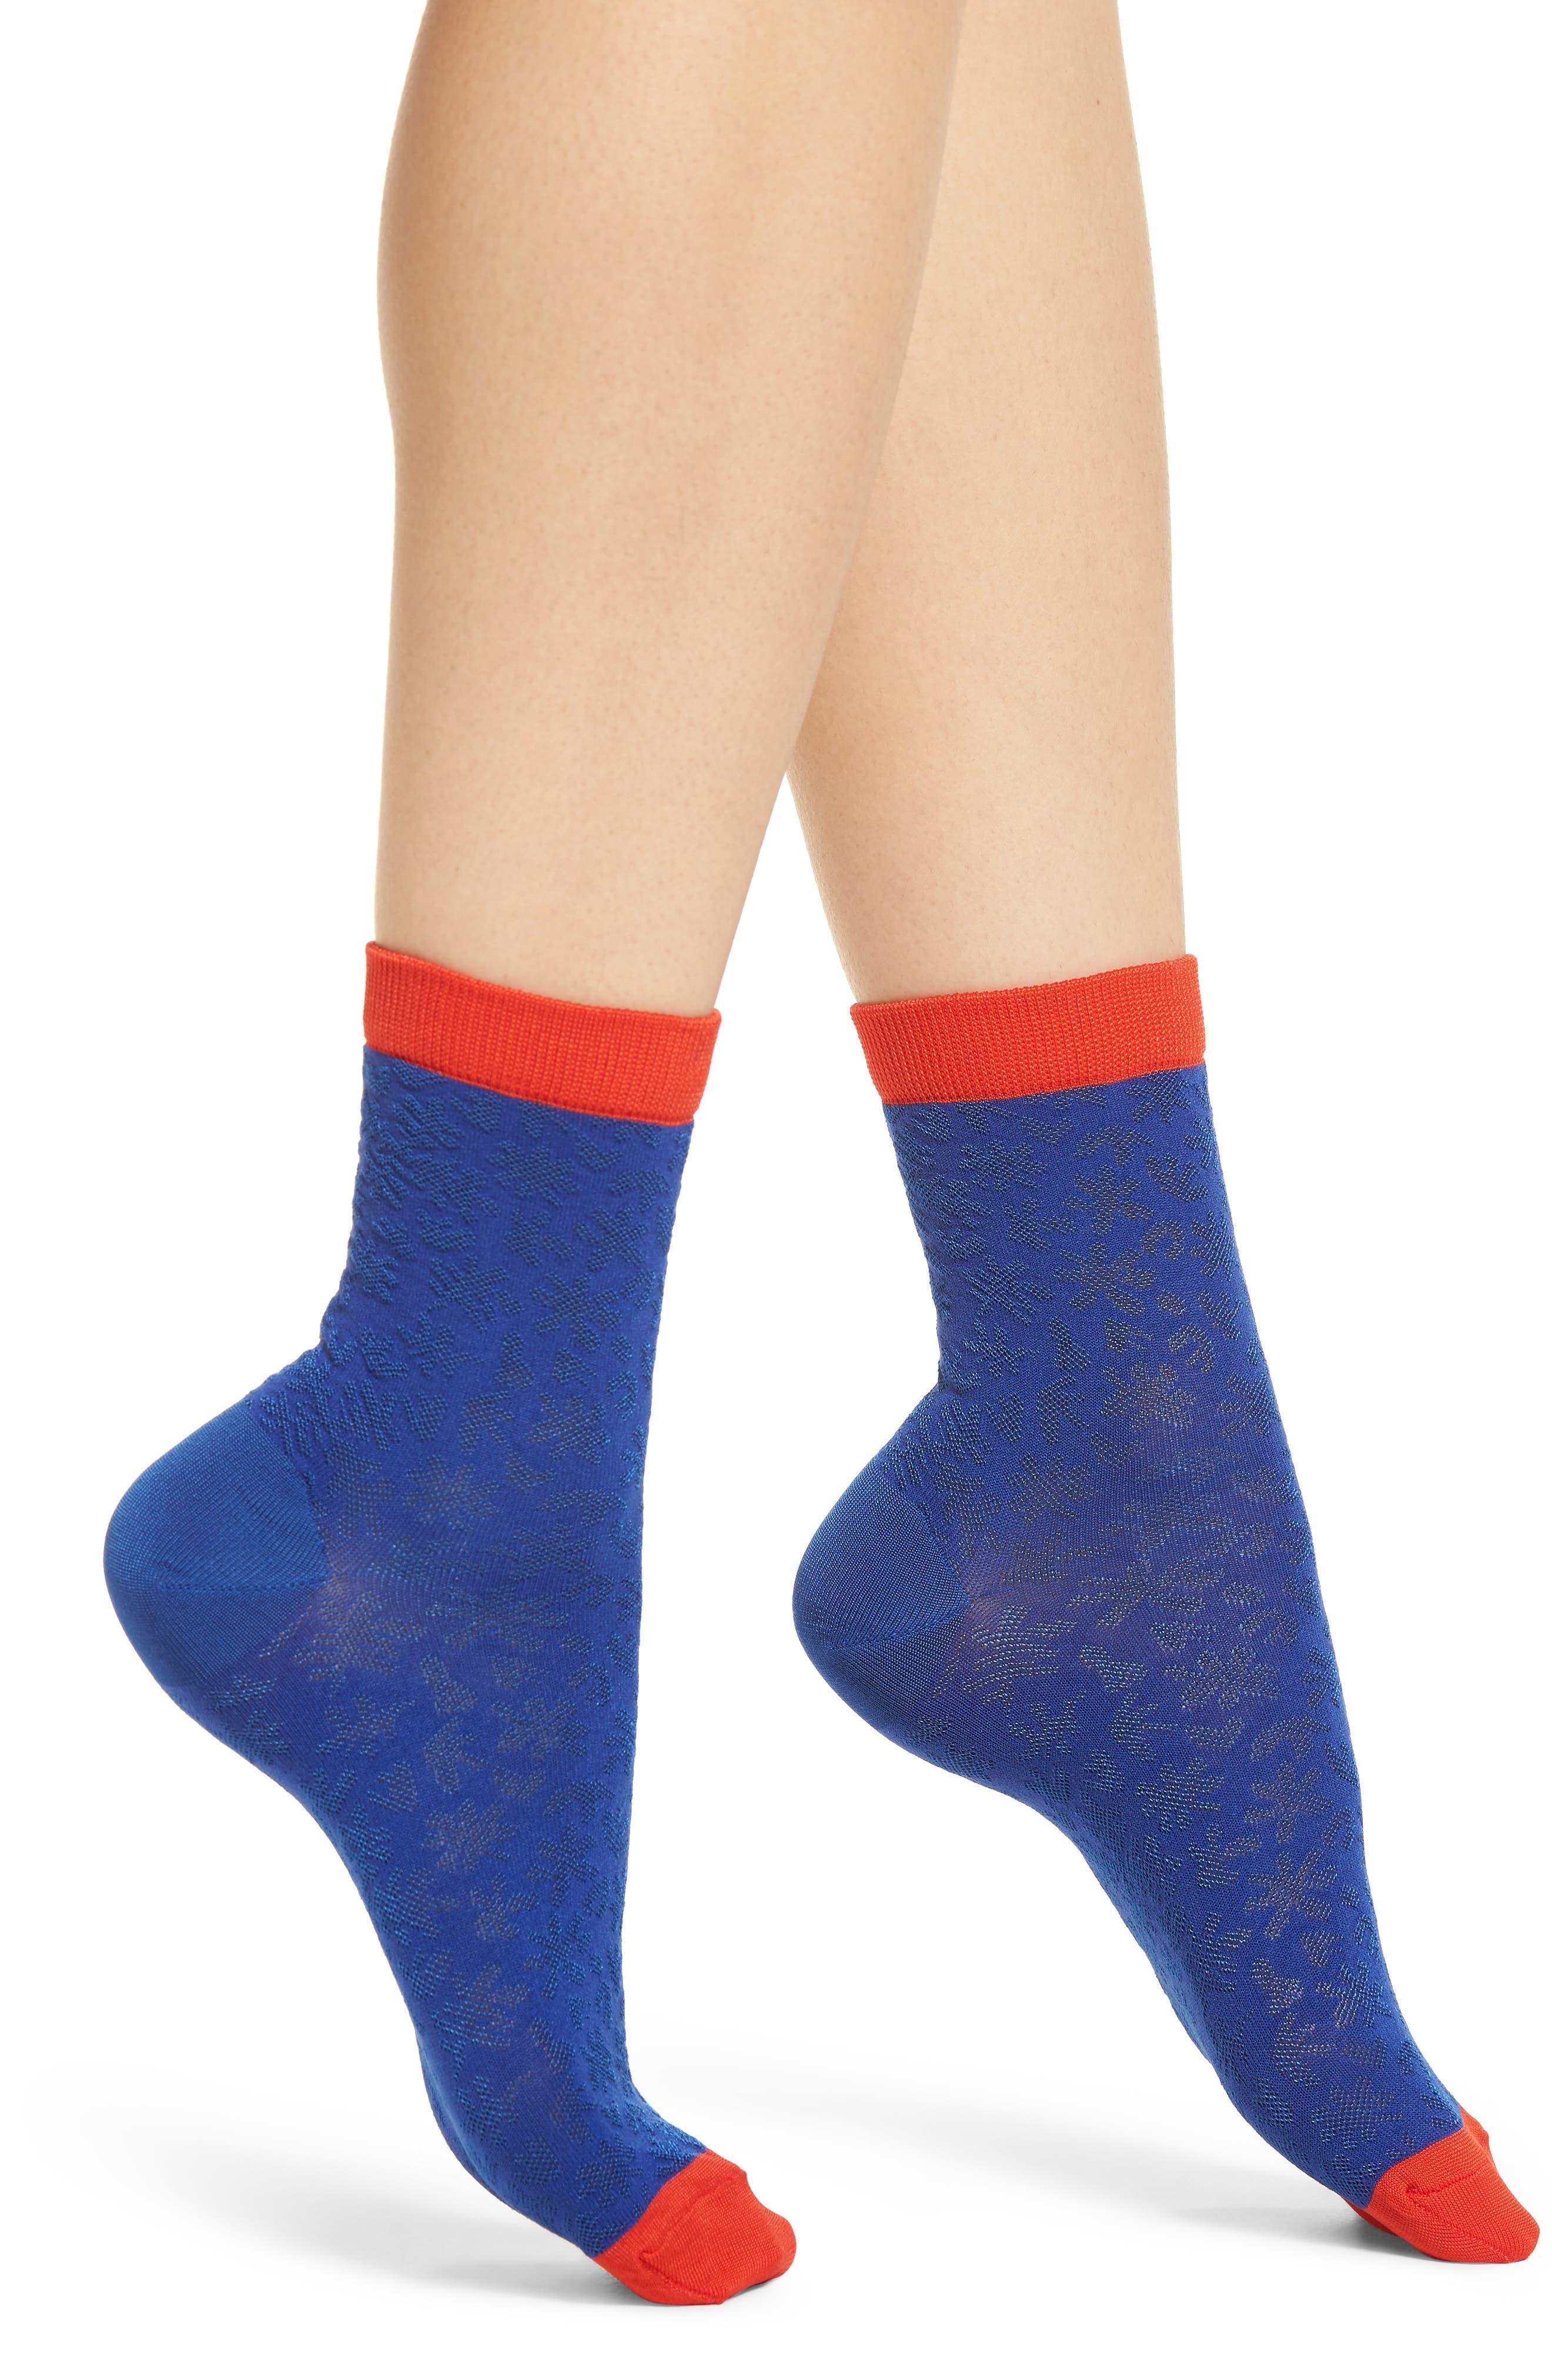 Lotta Ankle Socks,                             Main thumbnail 1, color,                             421